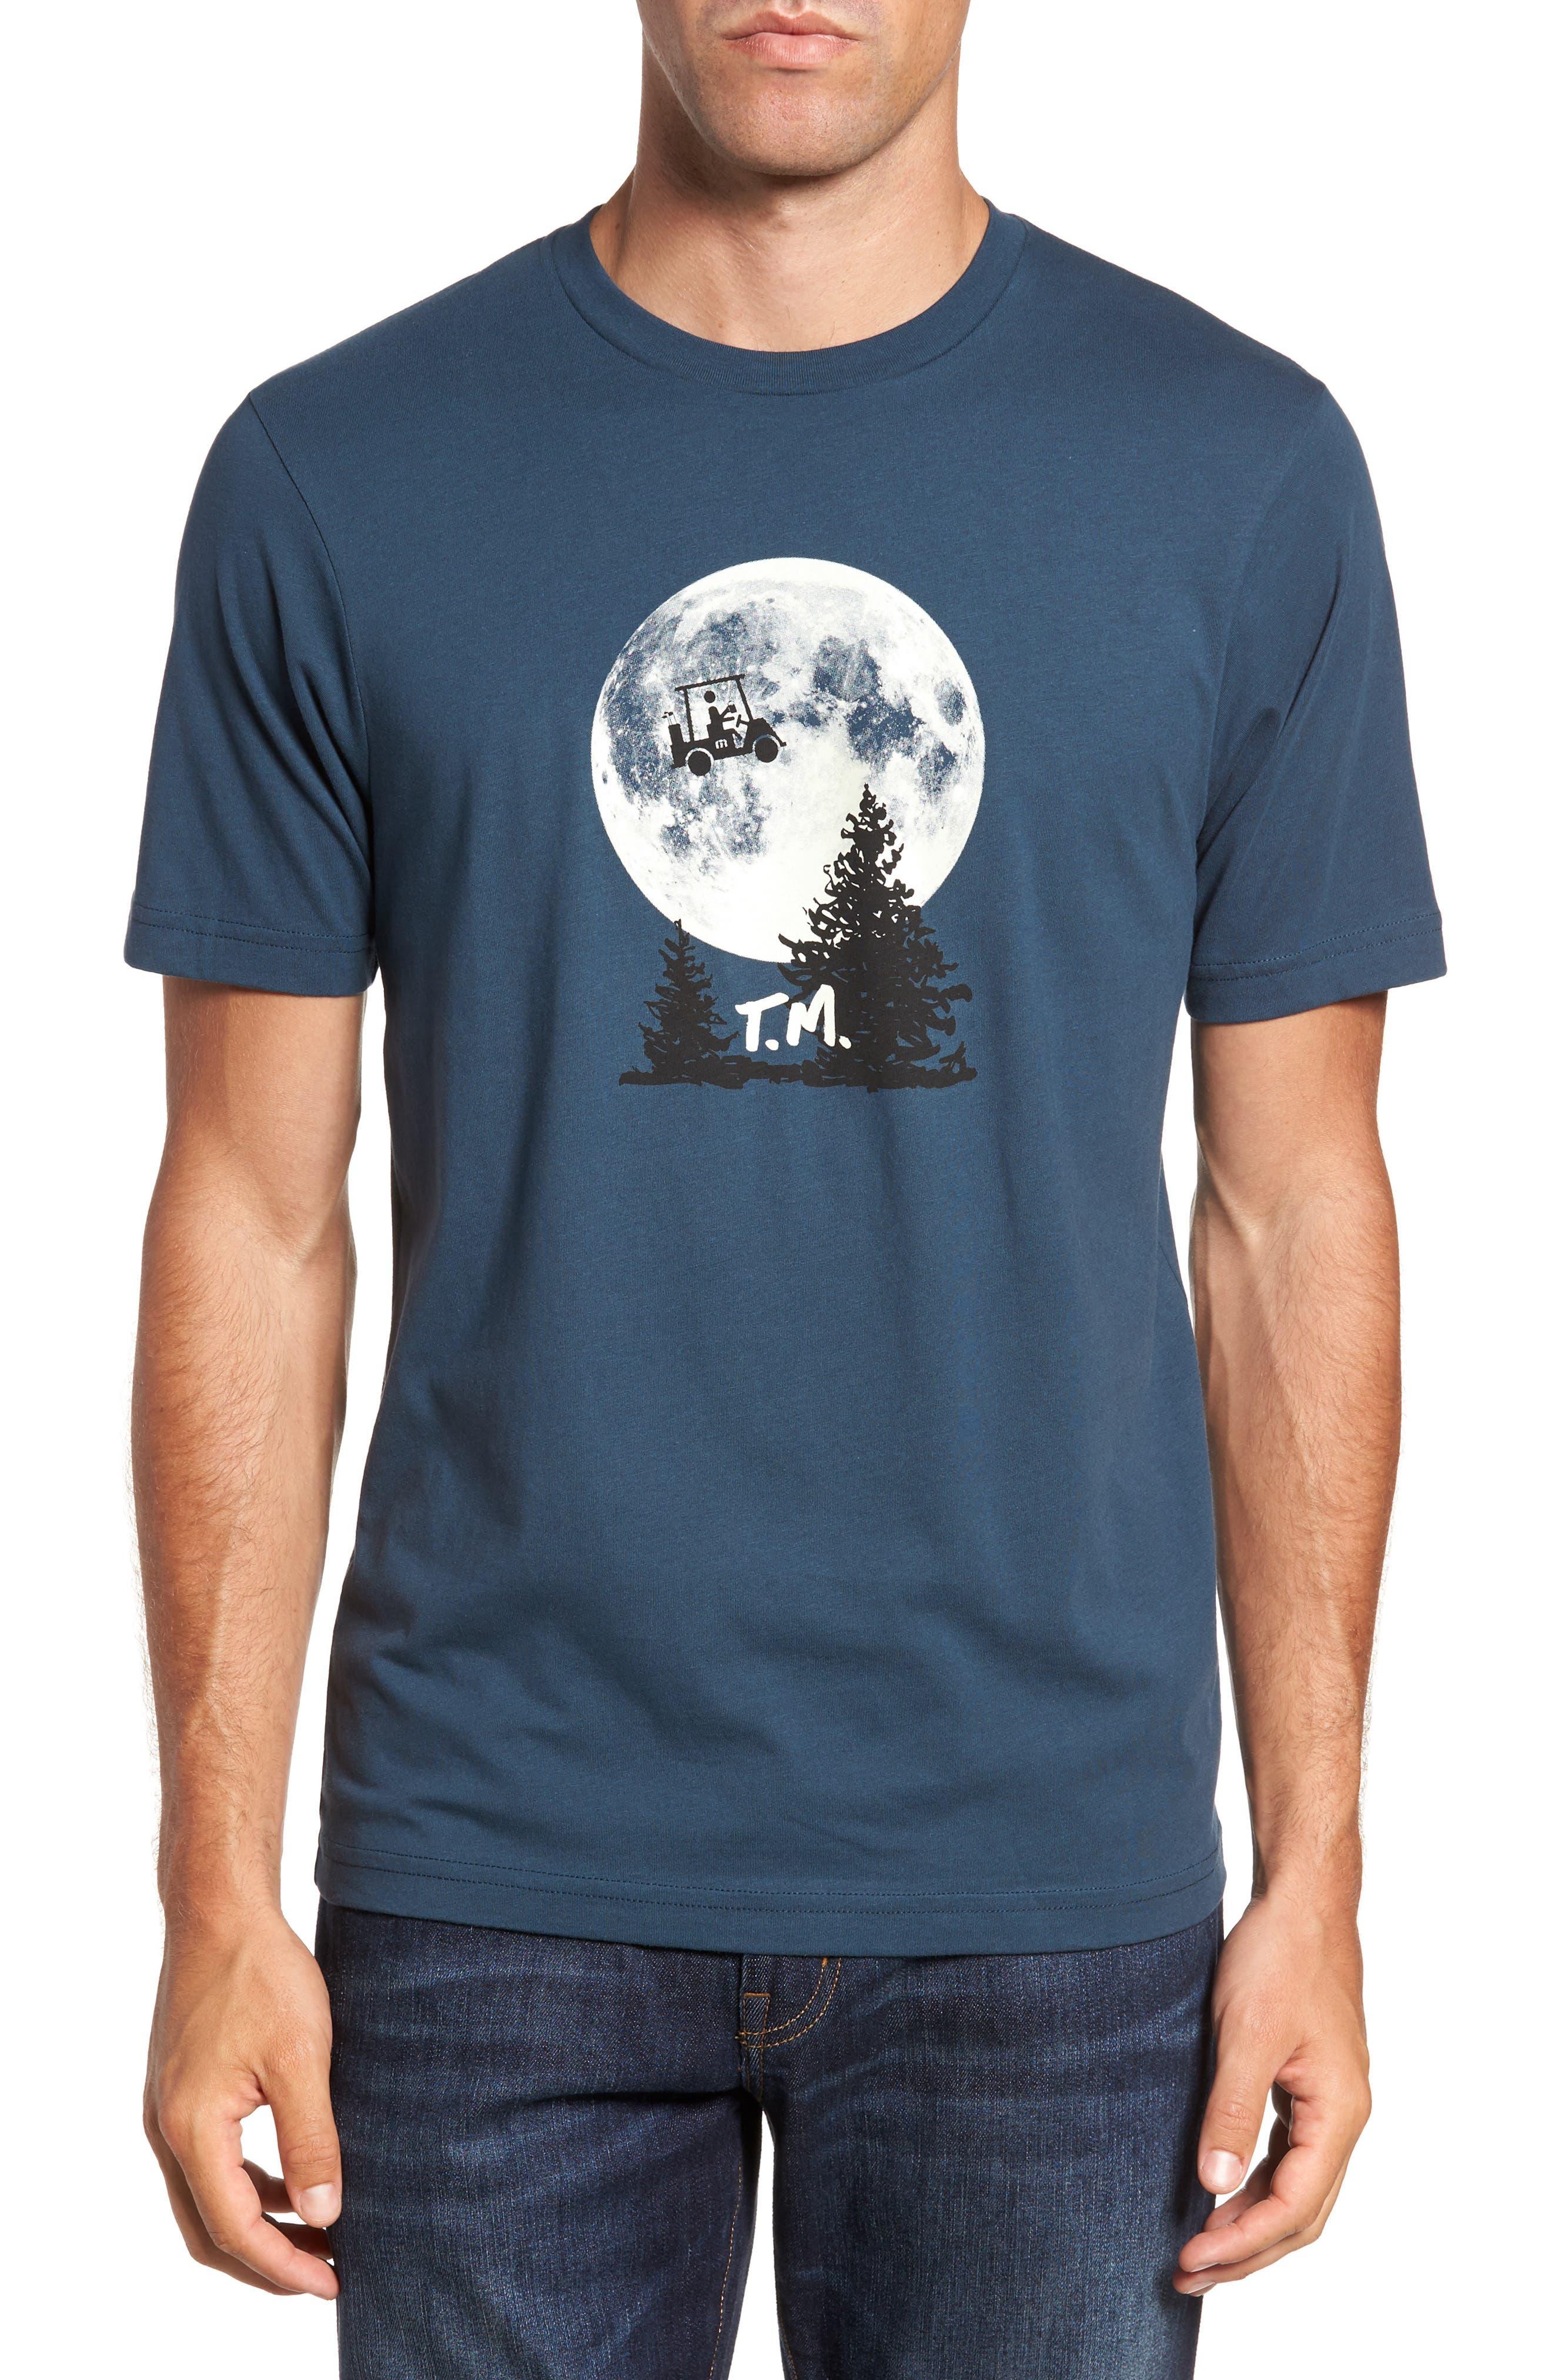 Travis Mathew 'Phone Home' Graphic T-Shirt